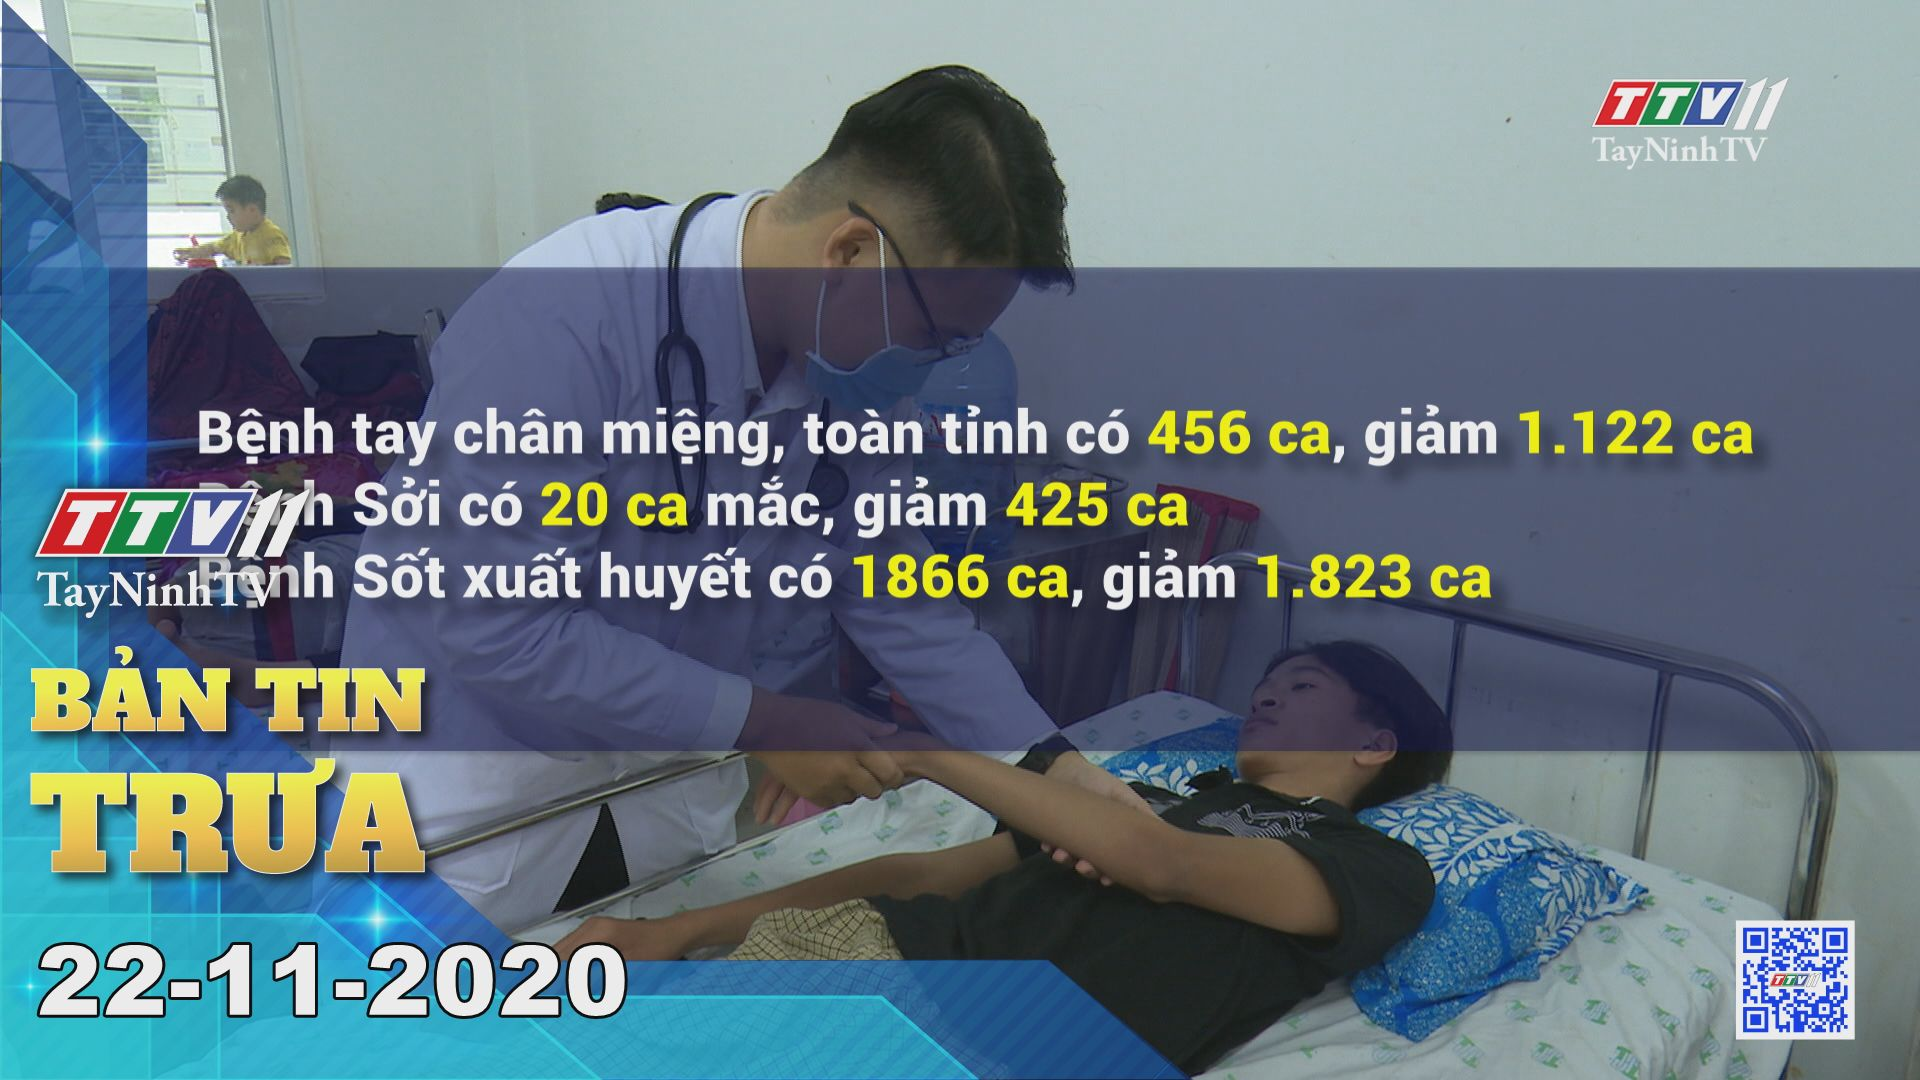 Bản tin trưa 22-11-2020 | Tin tức hôm nay | TayNinhTV